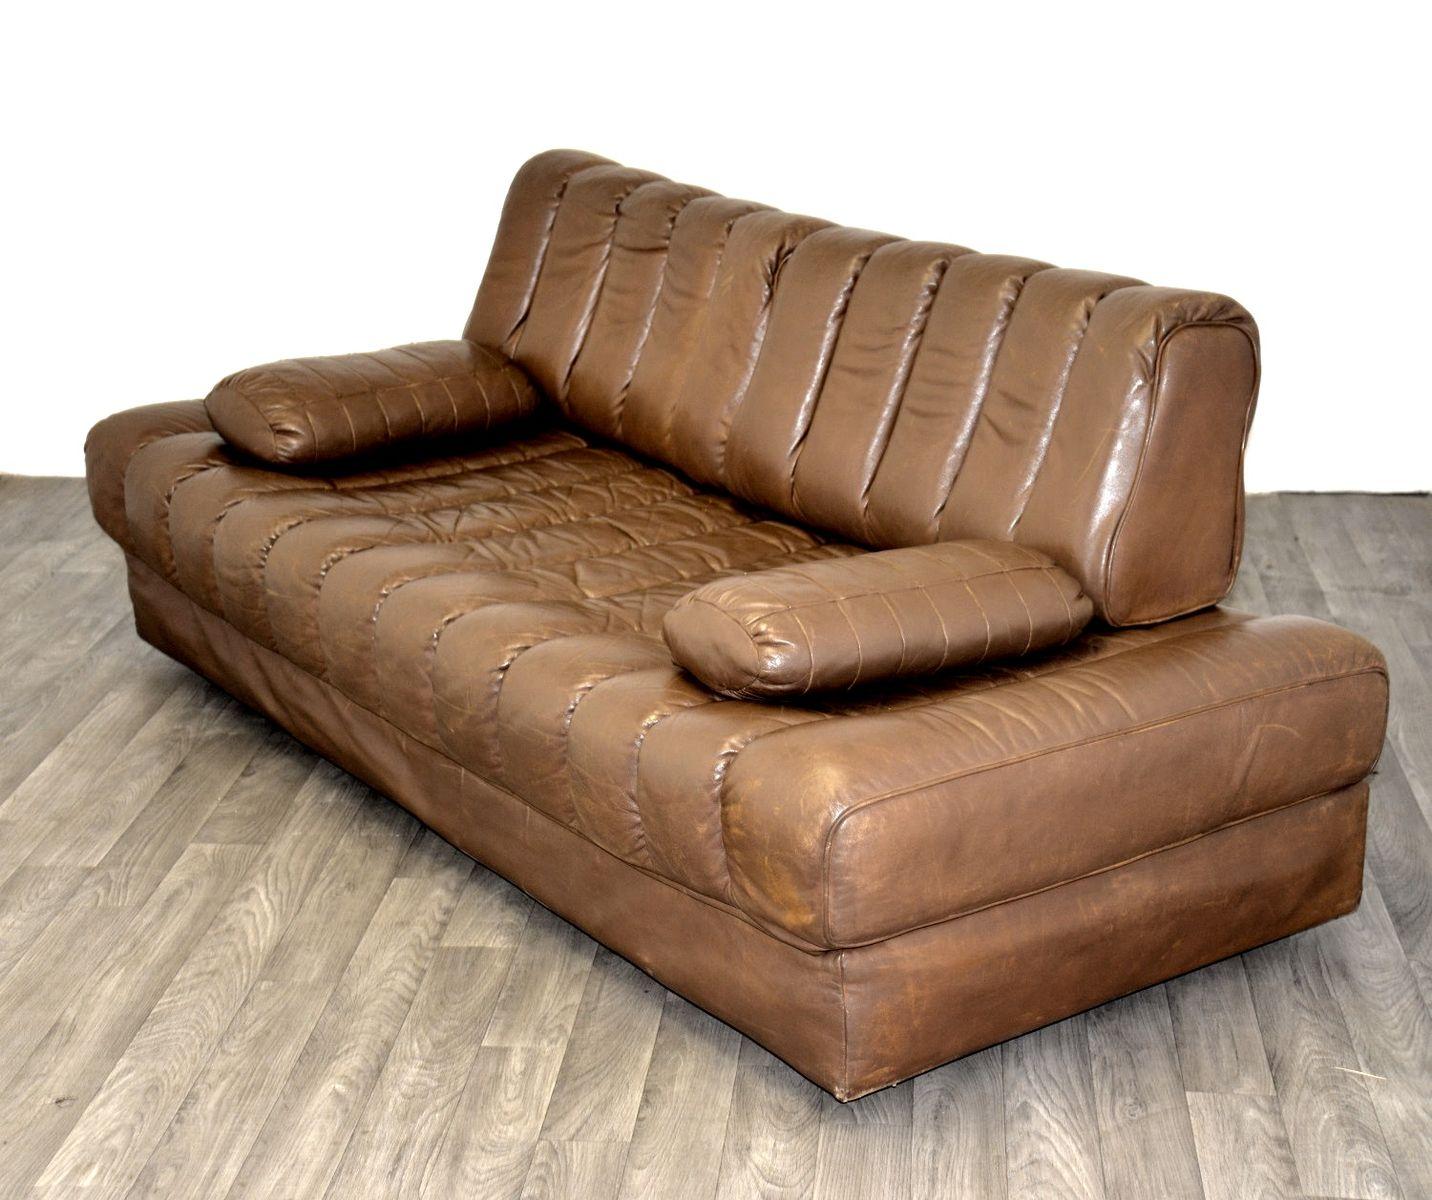 braunes schweizer ds 85 leder schlafsofa von de sede. Black Bedroom Furniture Sets. Home Design Ideas